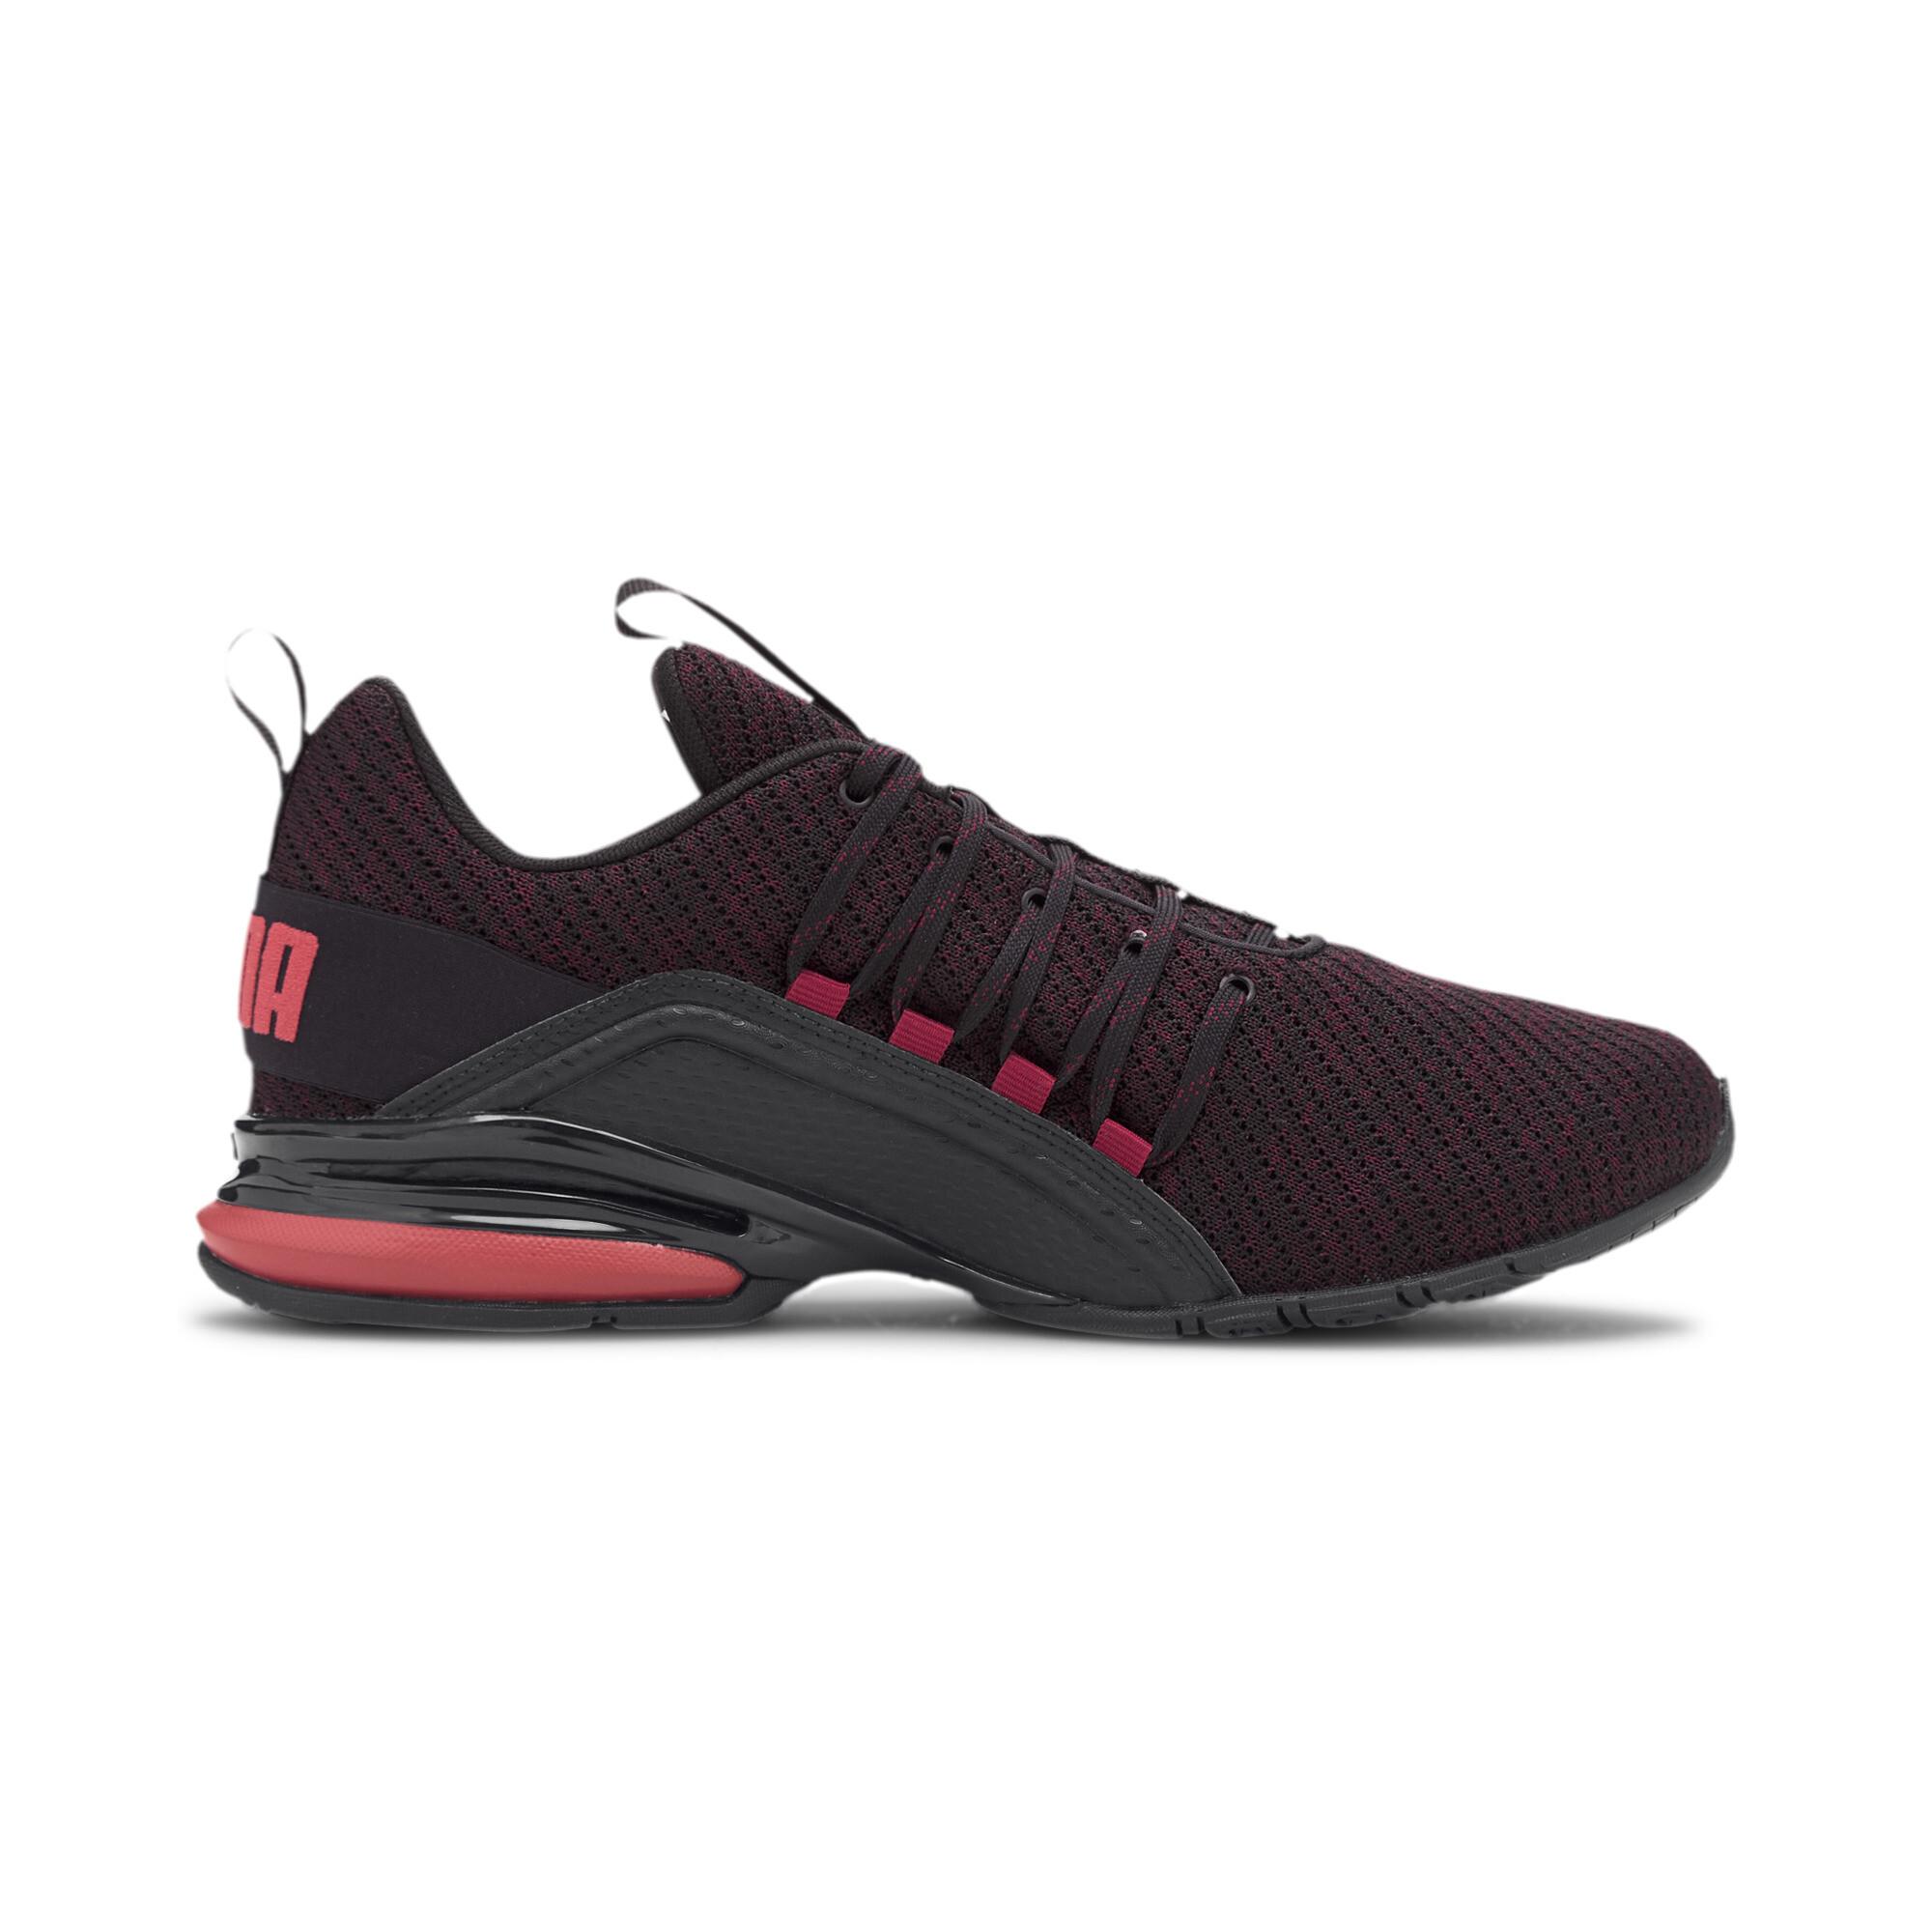 PUMA-Men-039-s-Axelion-Ultra-Running-Shoes thumbnail 14